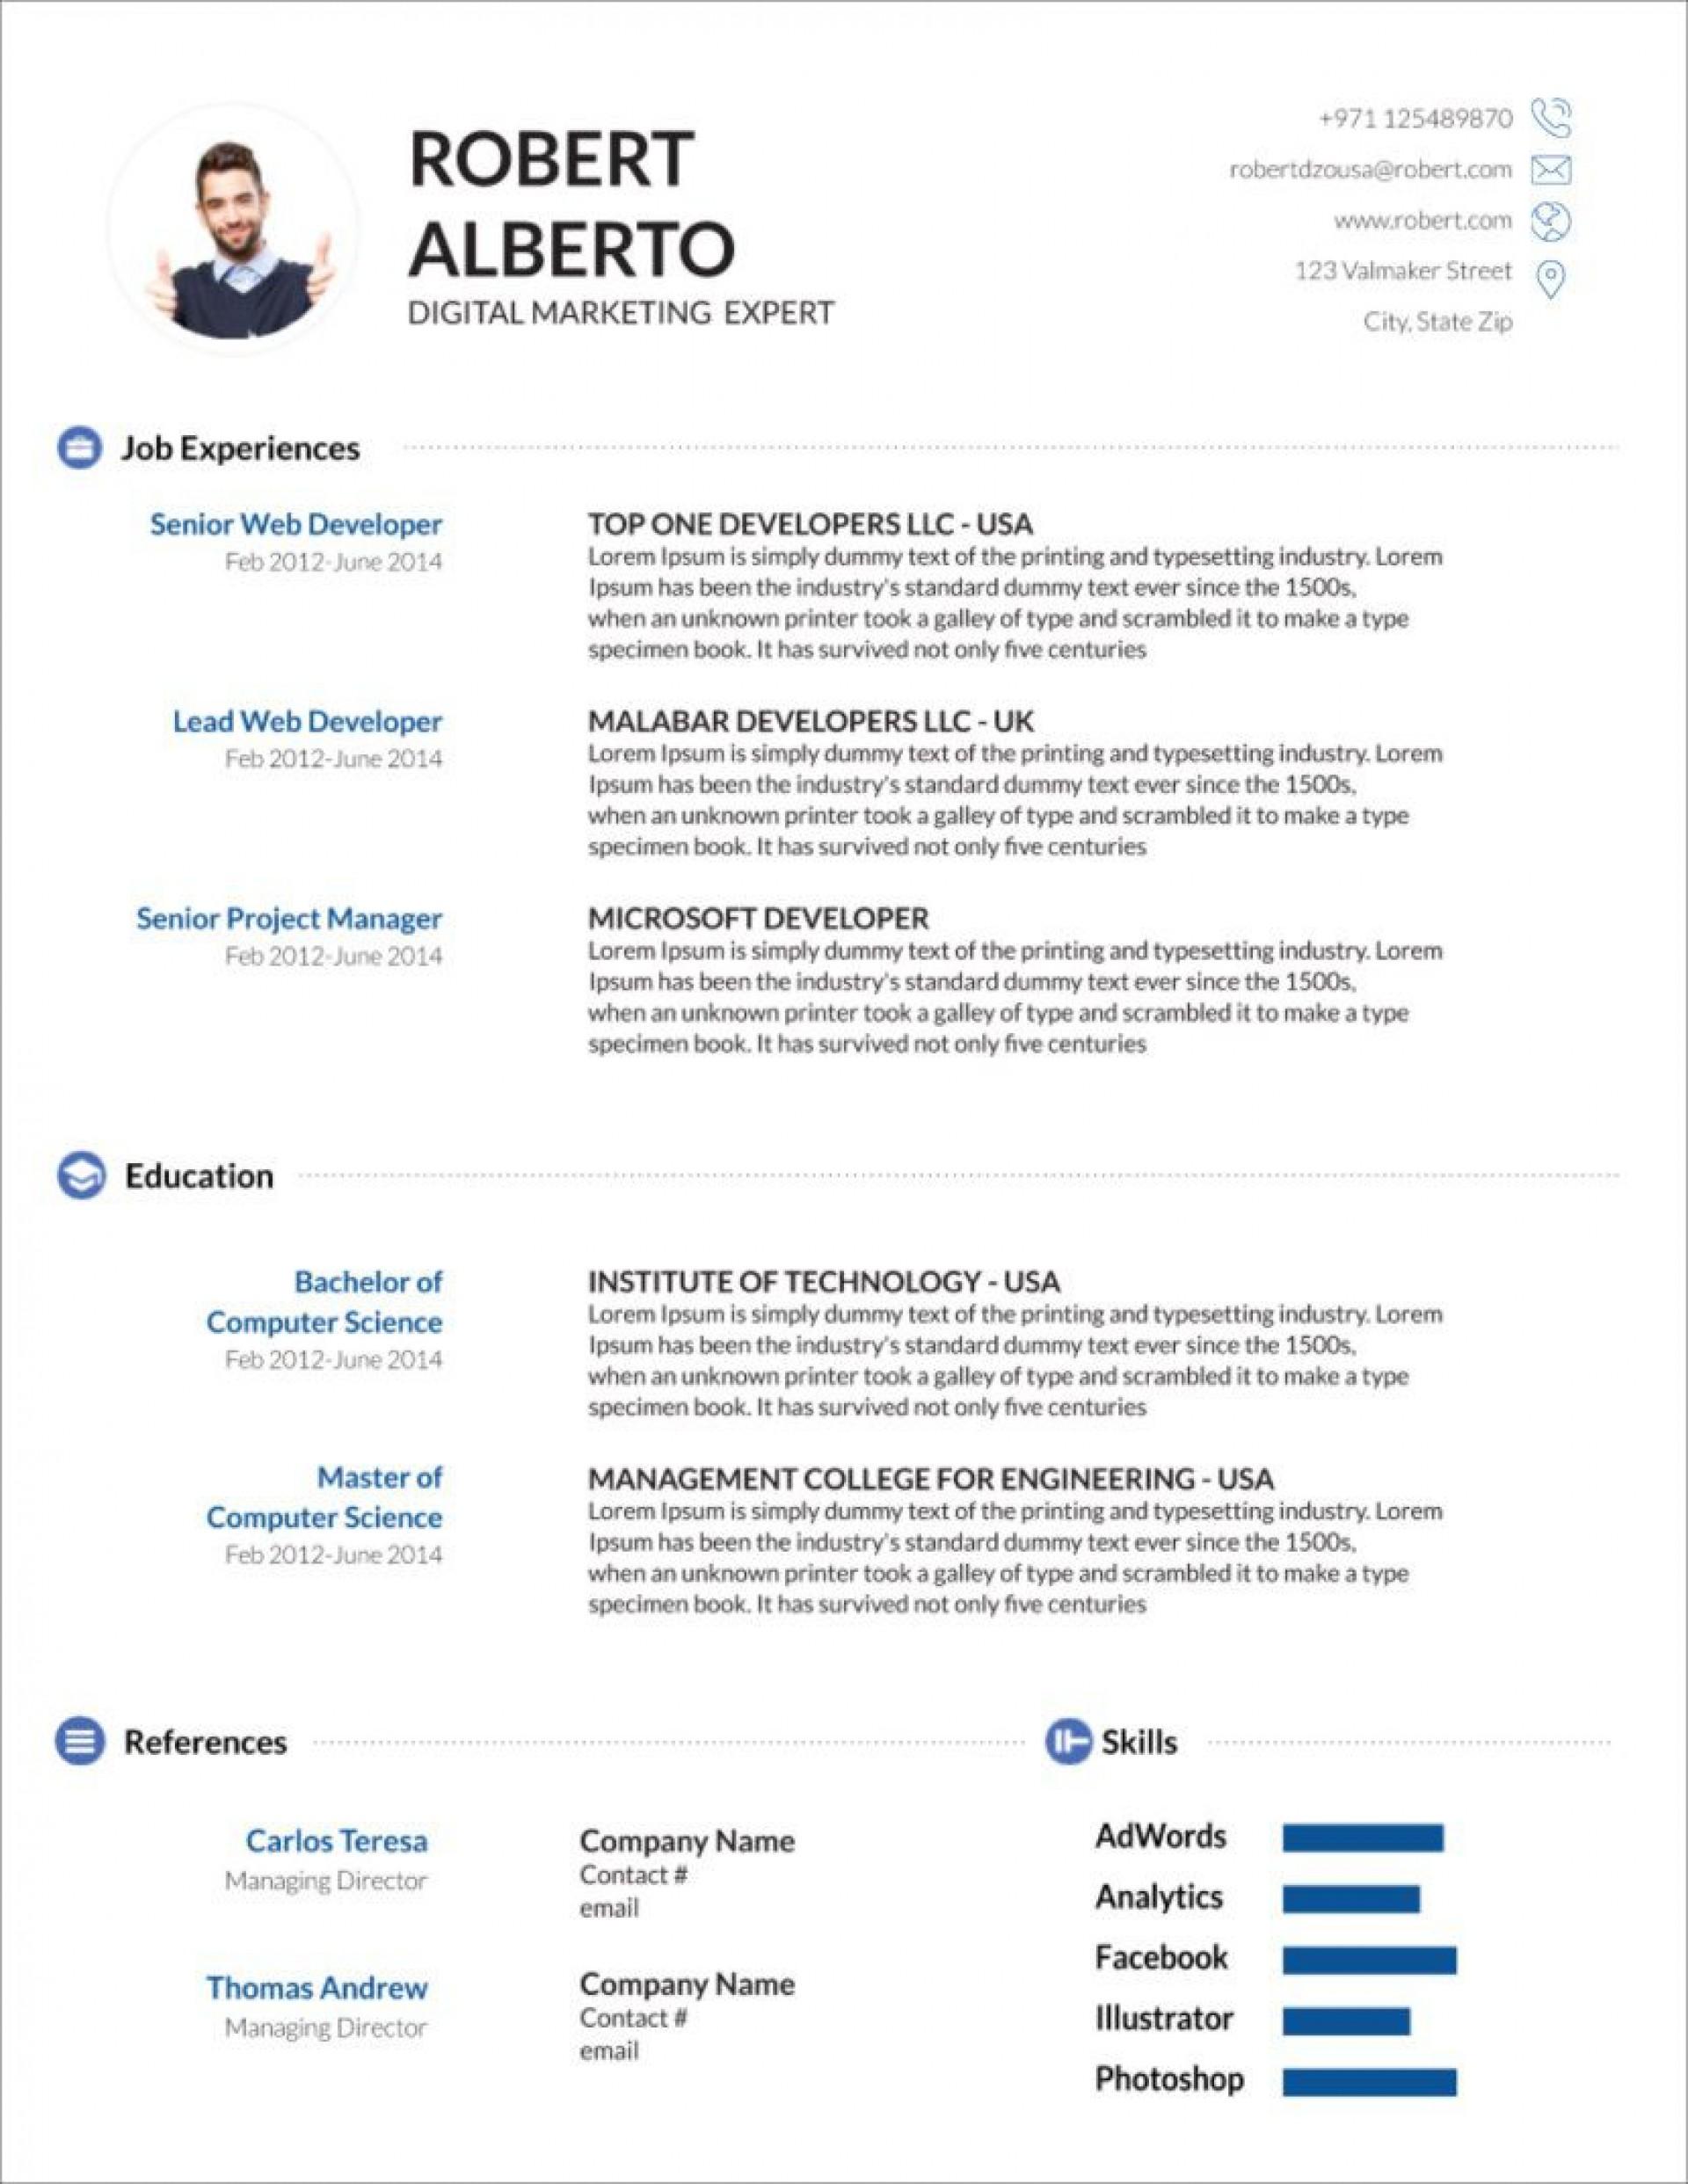 006 Amazing Curriculum Vitae Template Free Image  Sample Download Pdf Google Doc1920